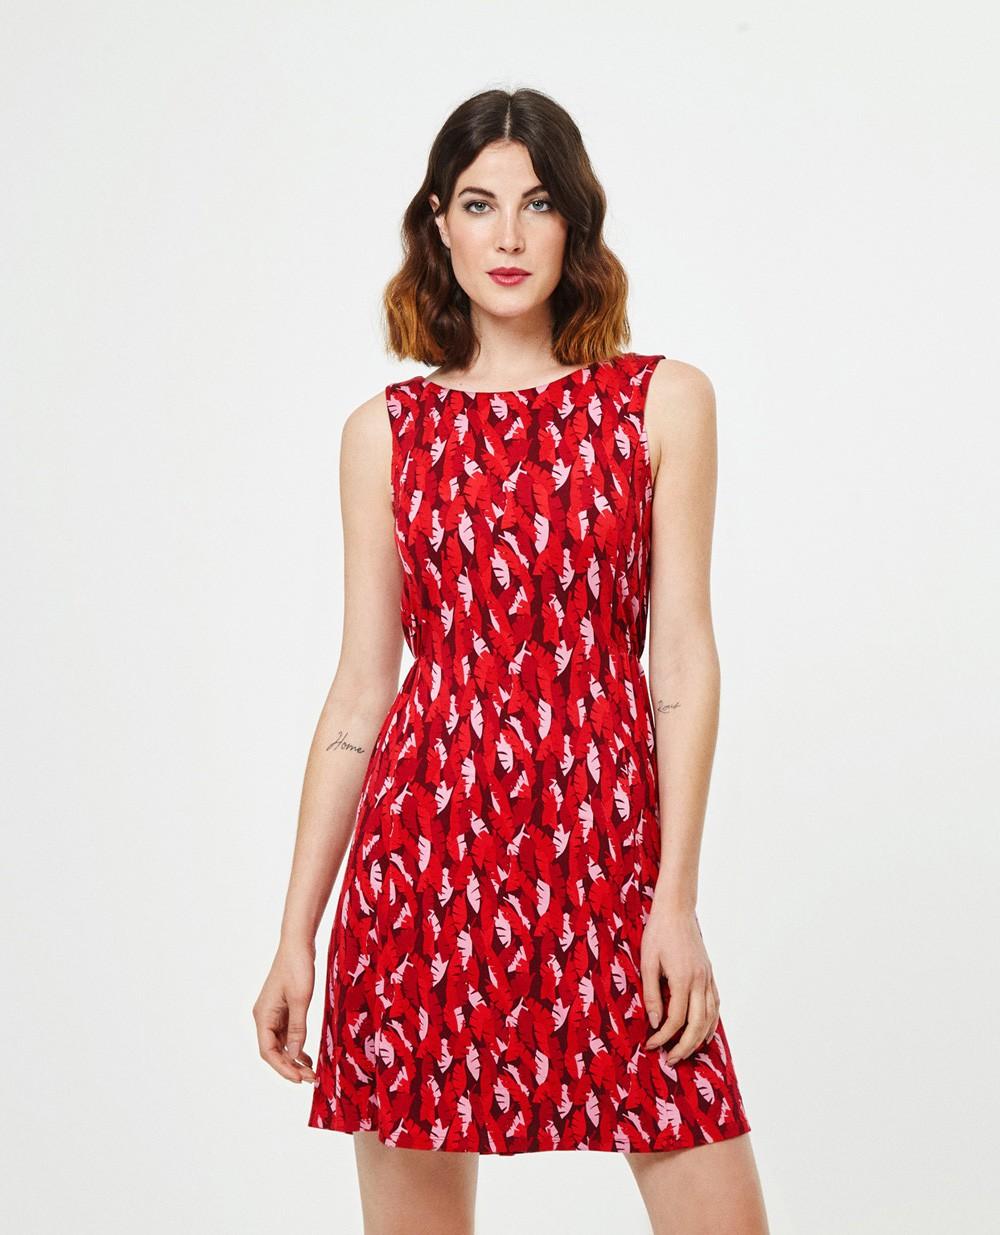 Superbe robe courte rouge Surkana Hoja Palmera